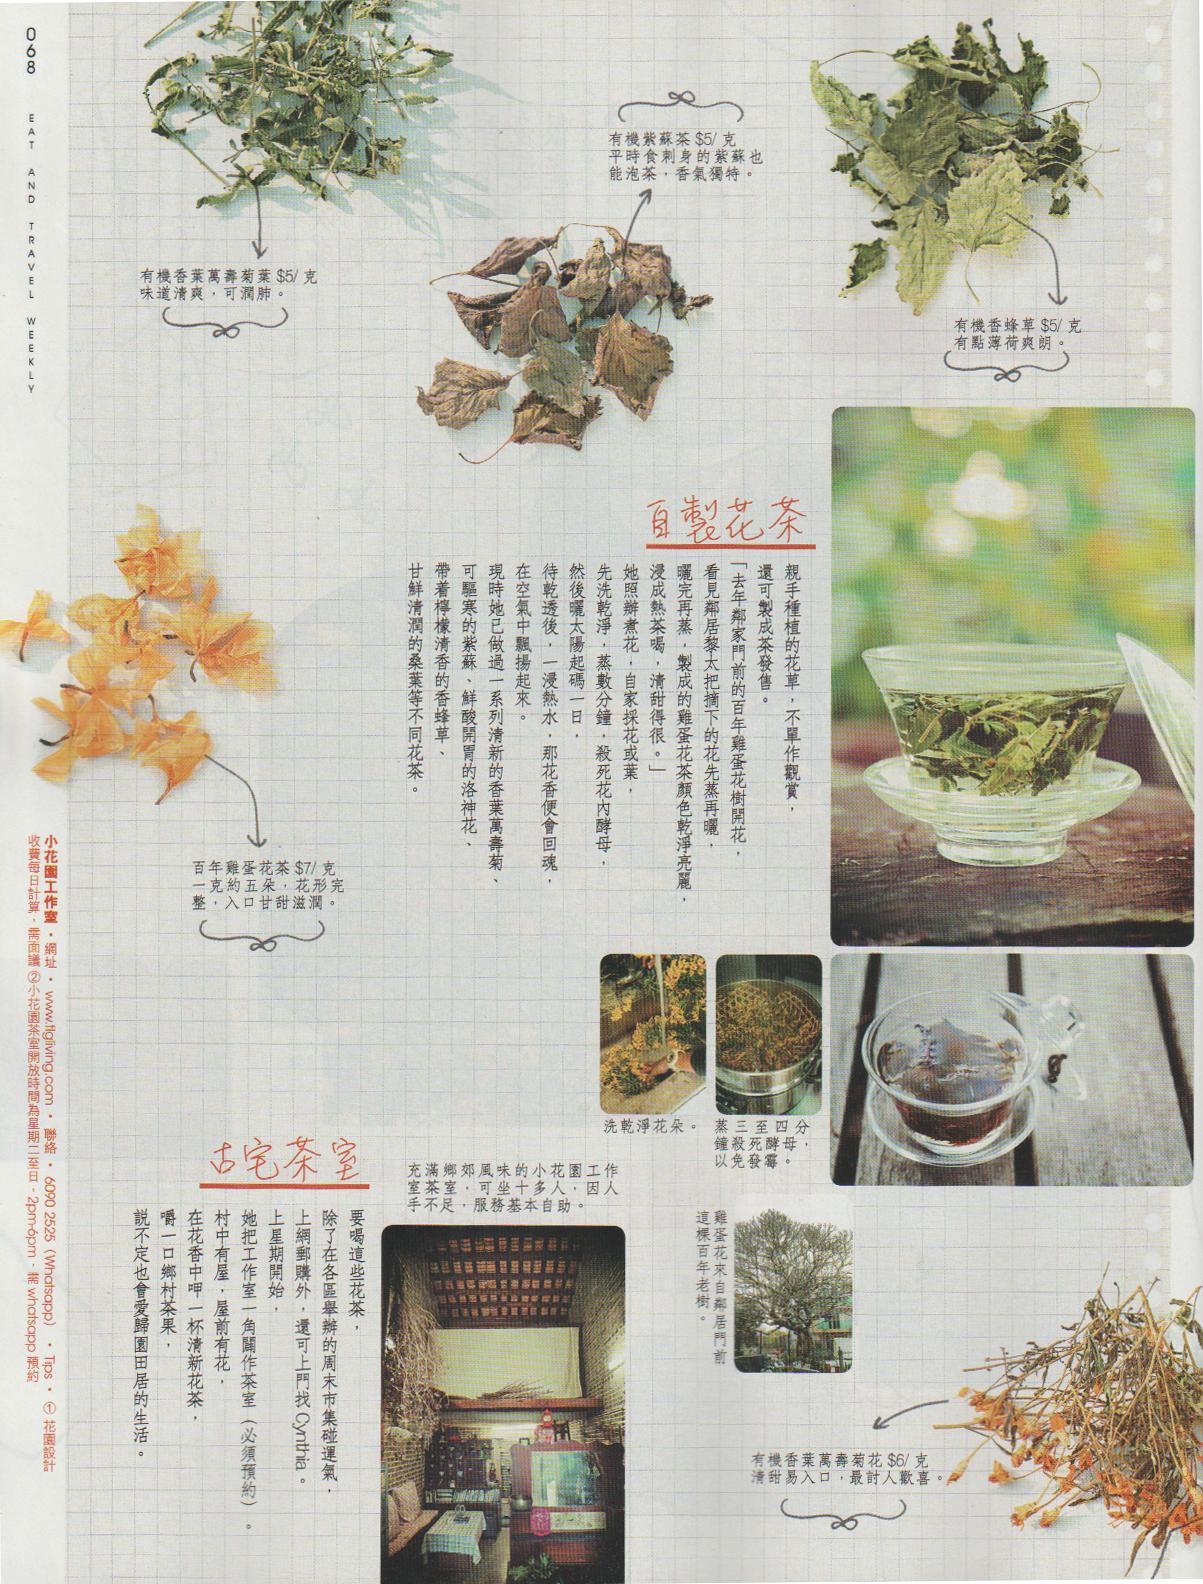 Jan 2015 Eat & Travel Weekly 飲食男女 P3